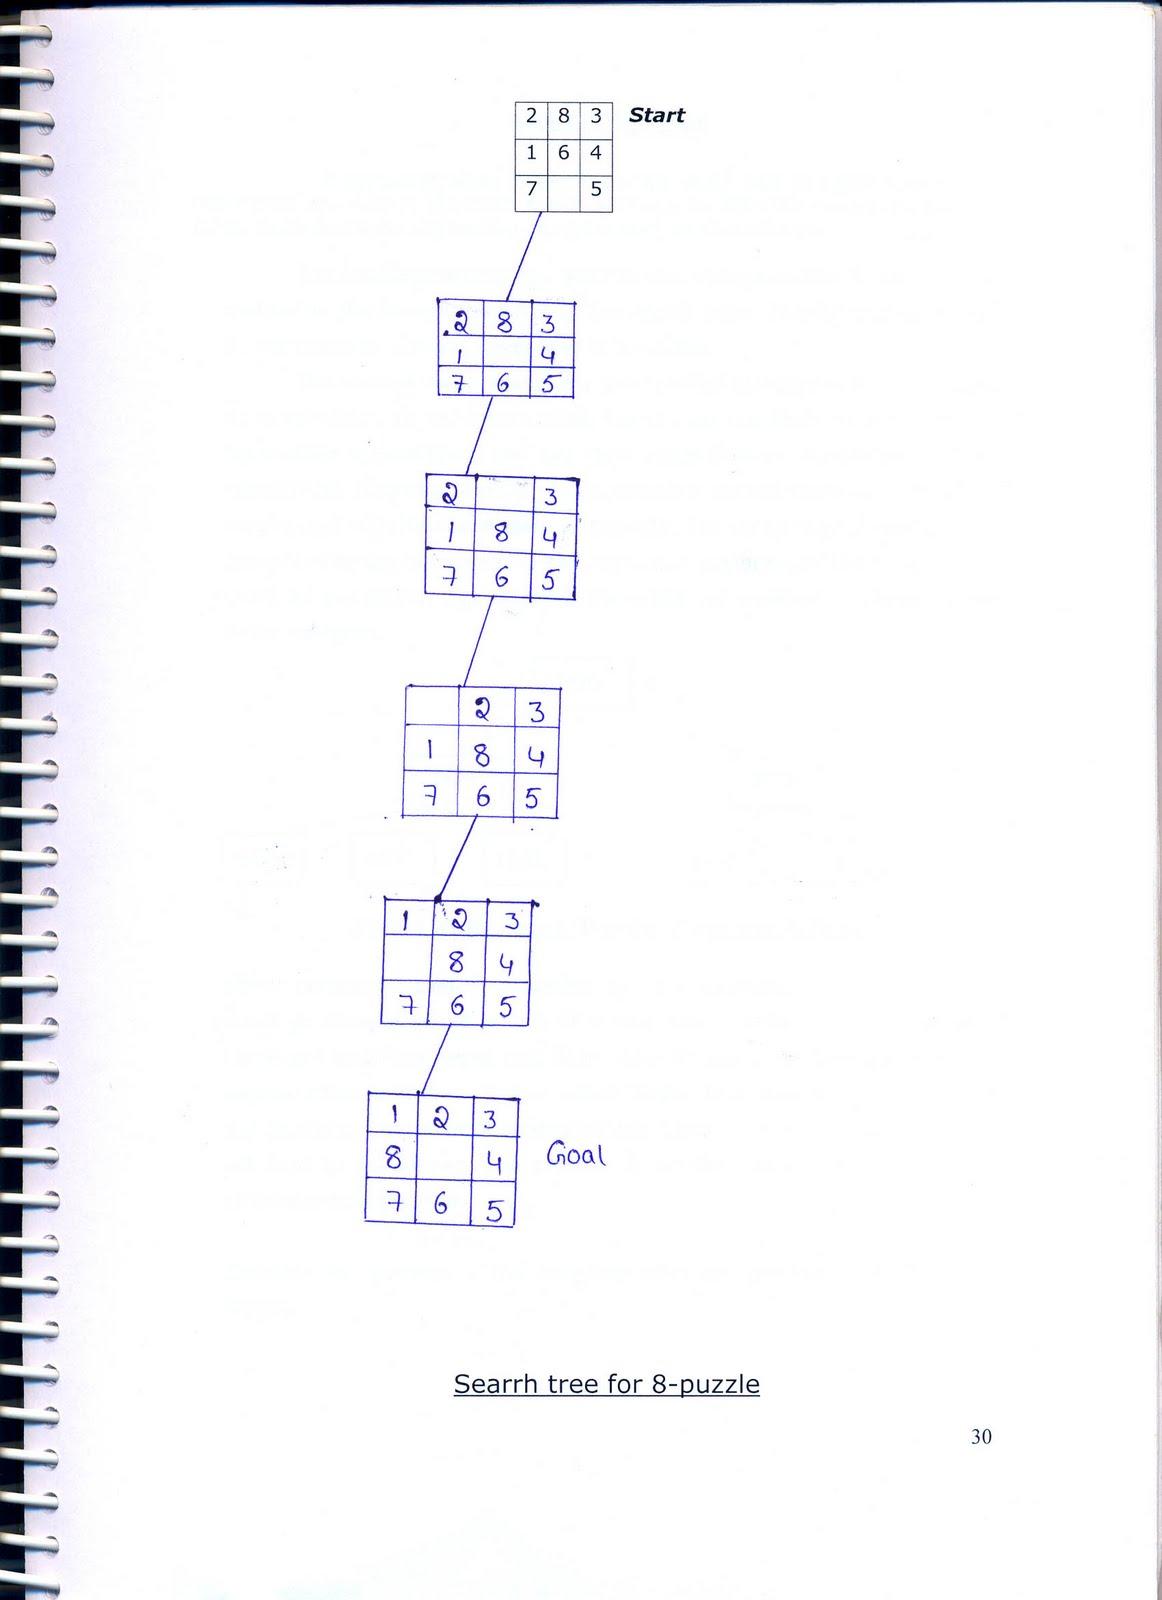 Artificial Intelligence: 8 Puzzle Problem